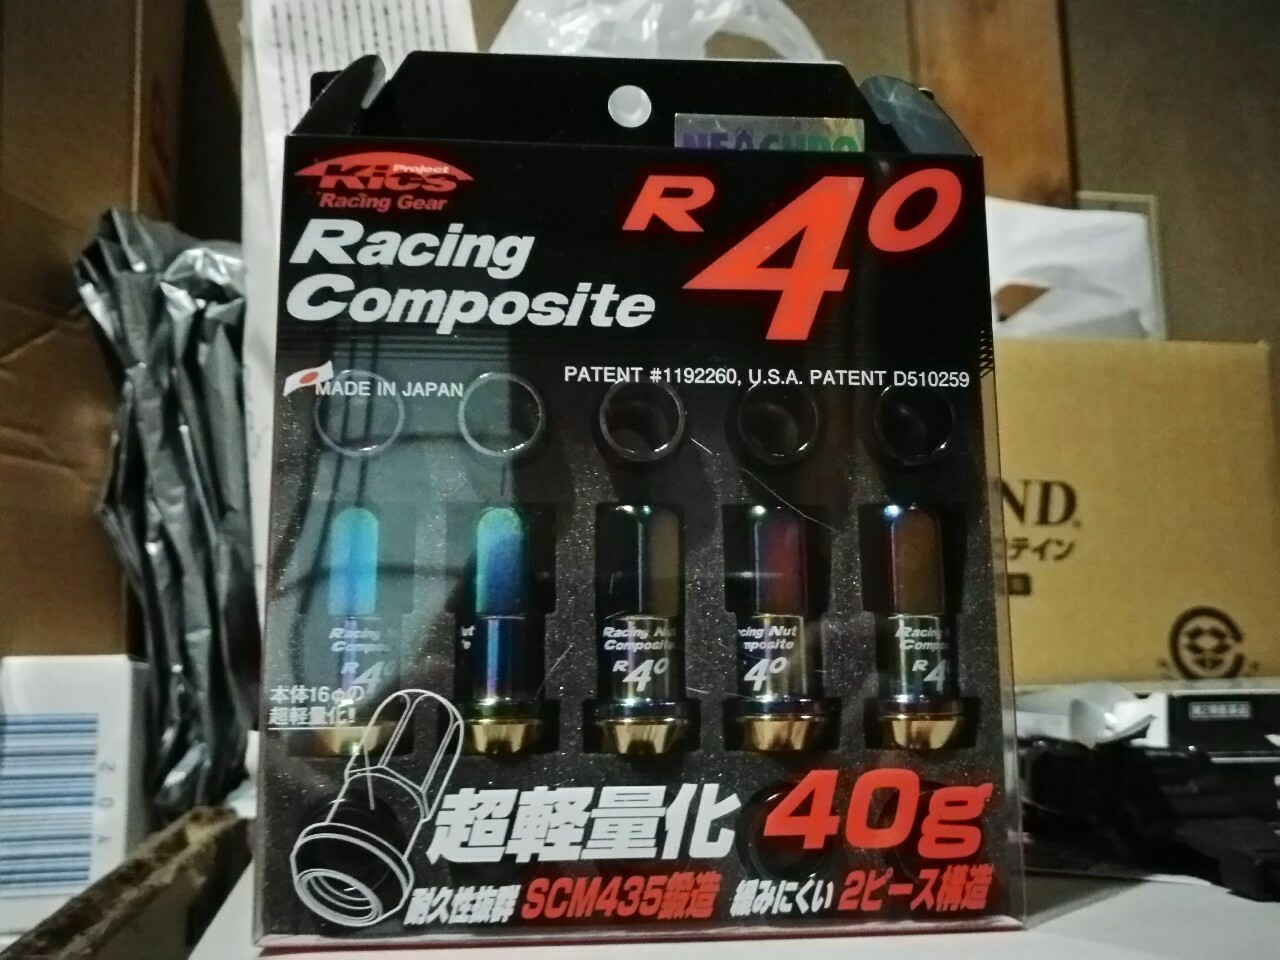 KYO-EI / 協永産業 KicS Racing gear レーシングコンポジットR40(ネオクロ)